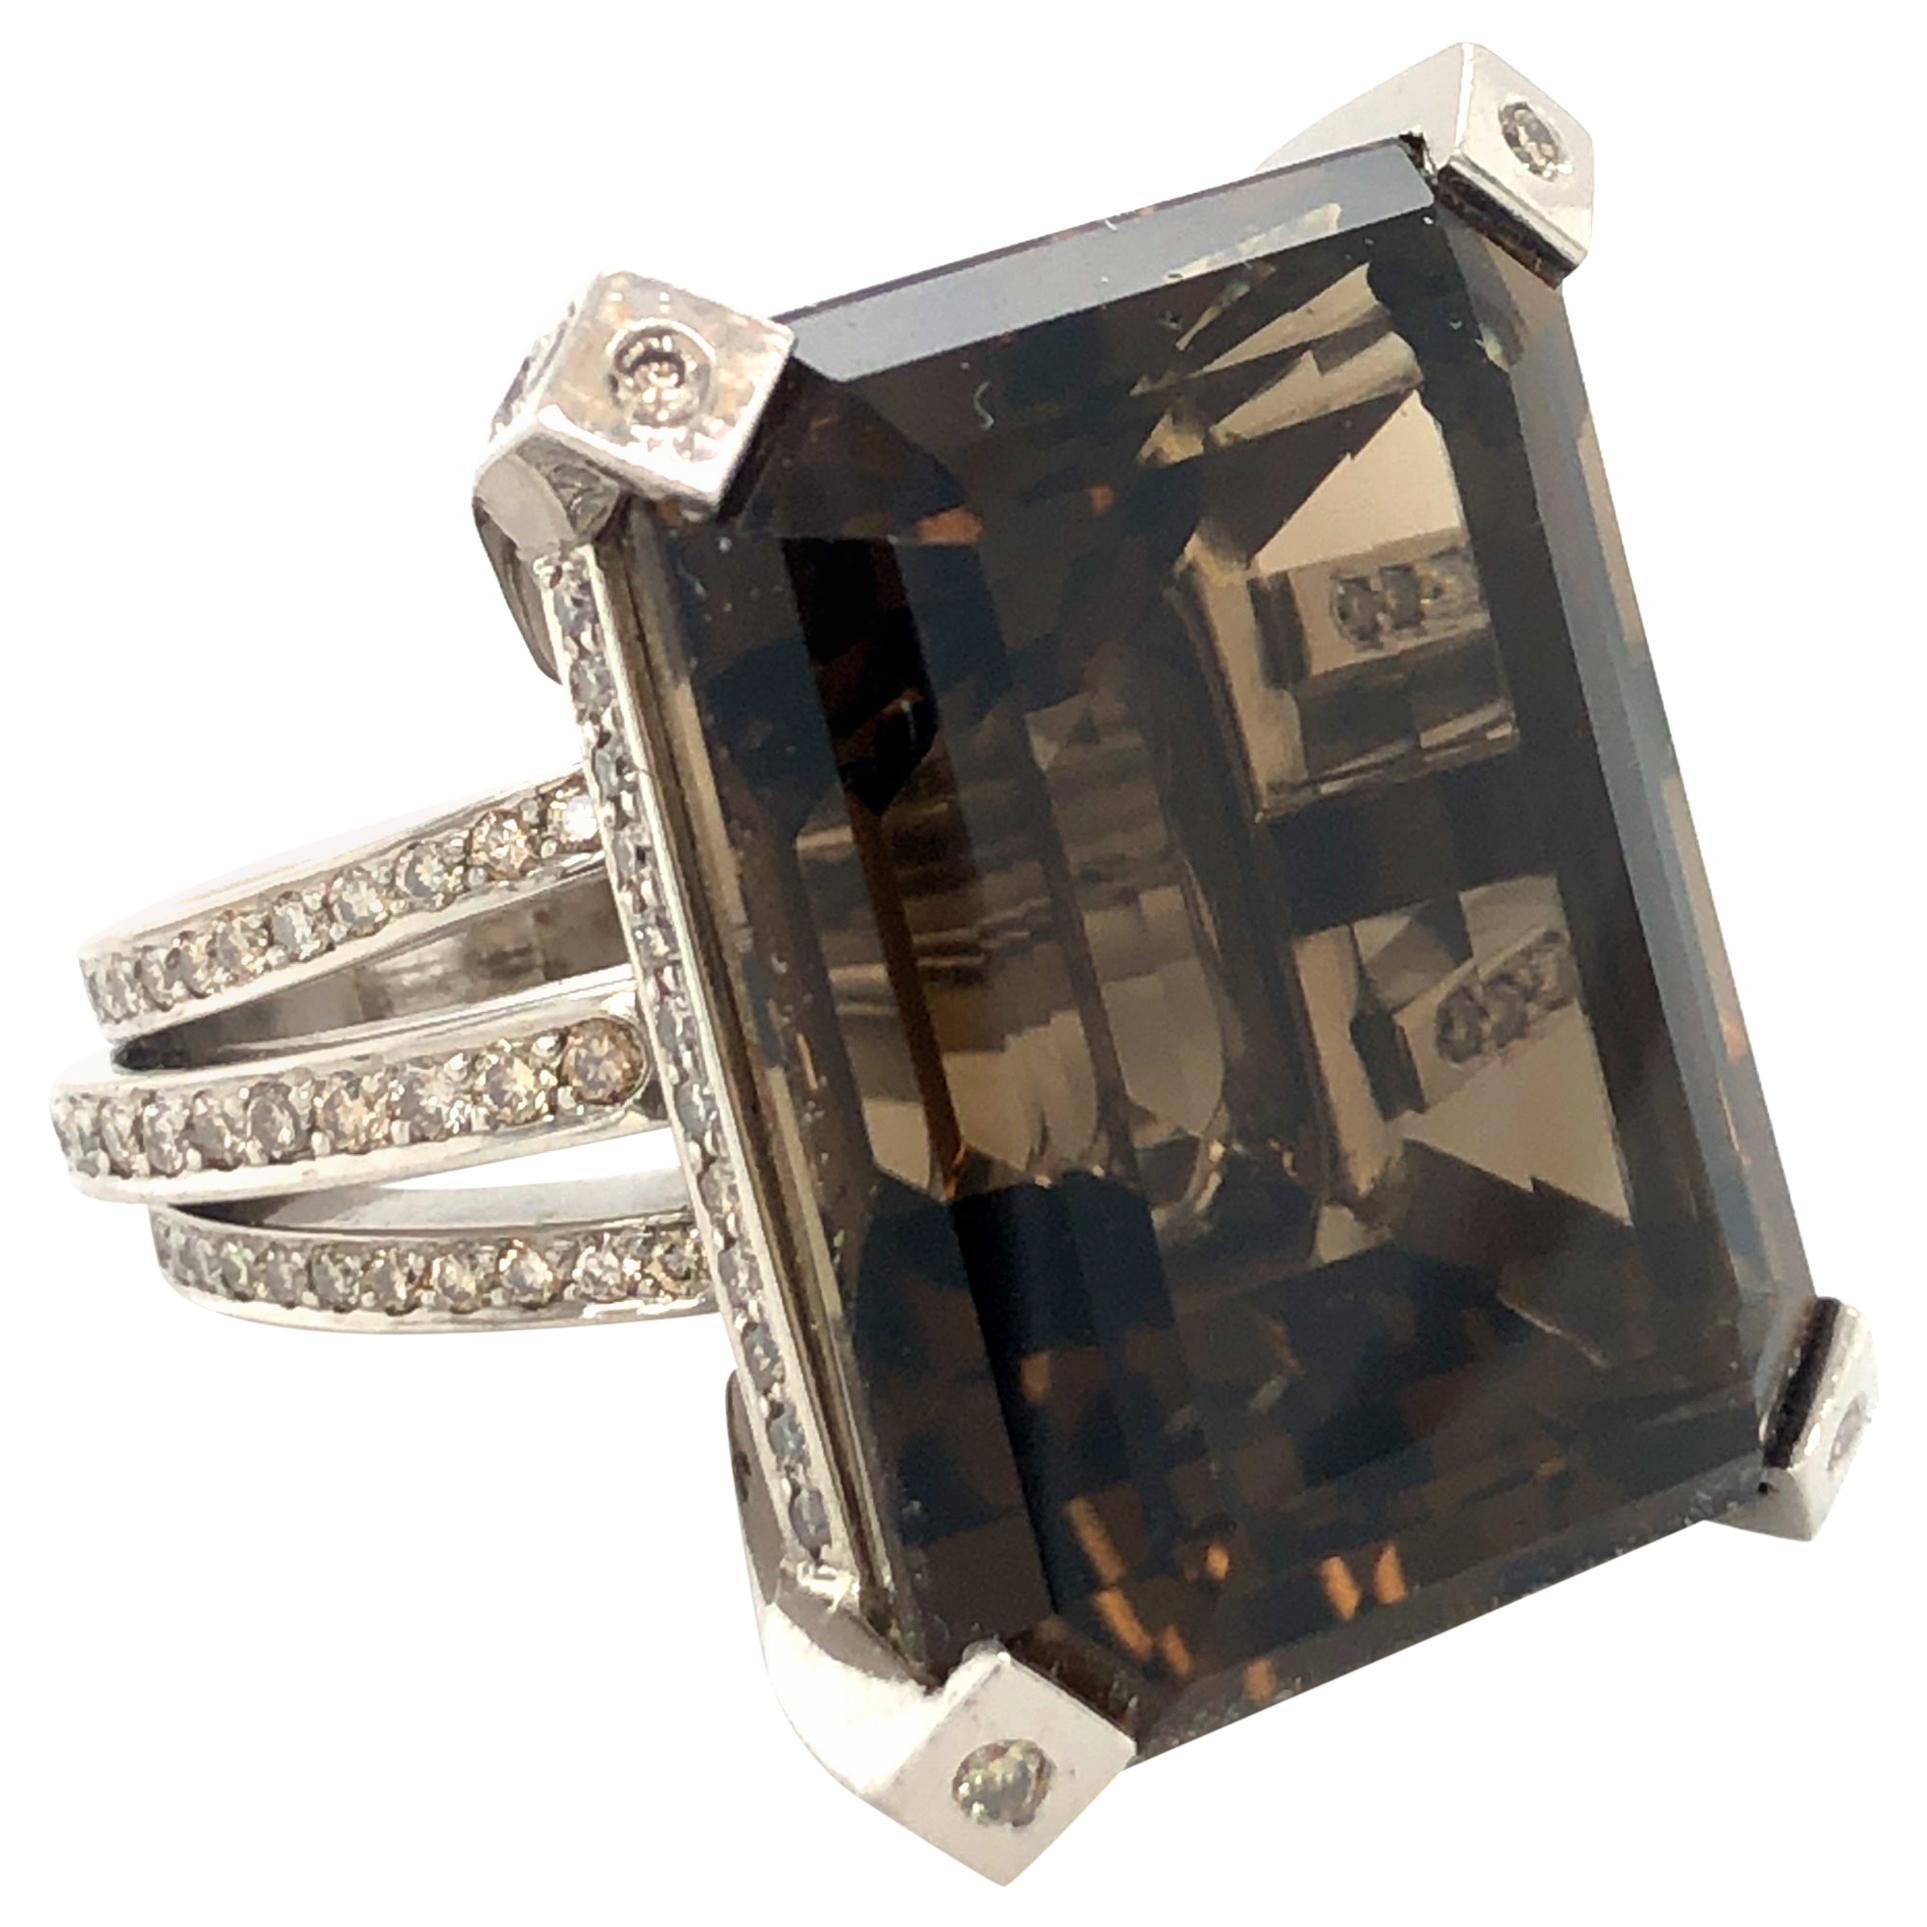 Grand Smoky Quartz and Diamond Cocktail Ring in 18 Karat White Gold